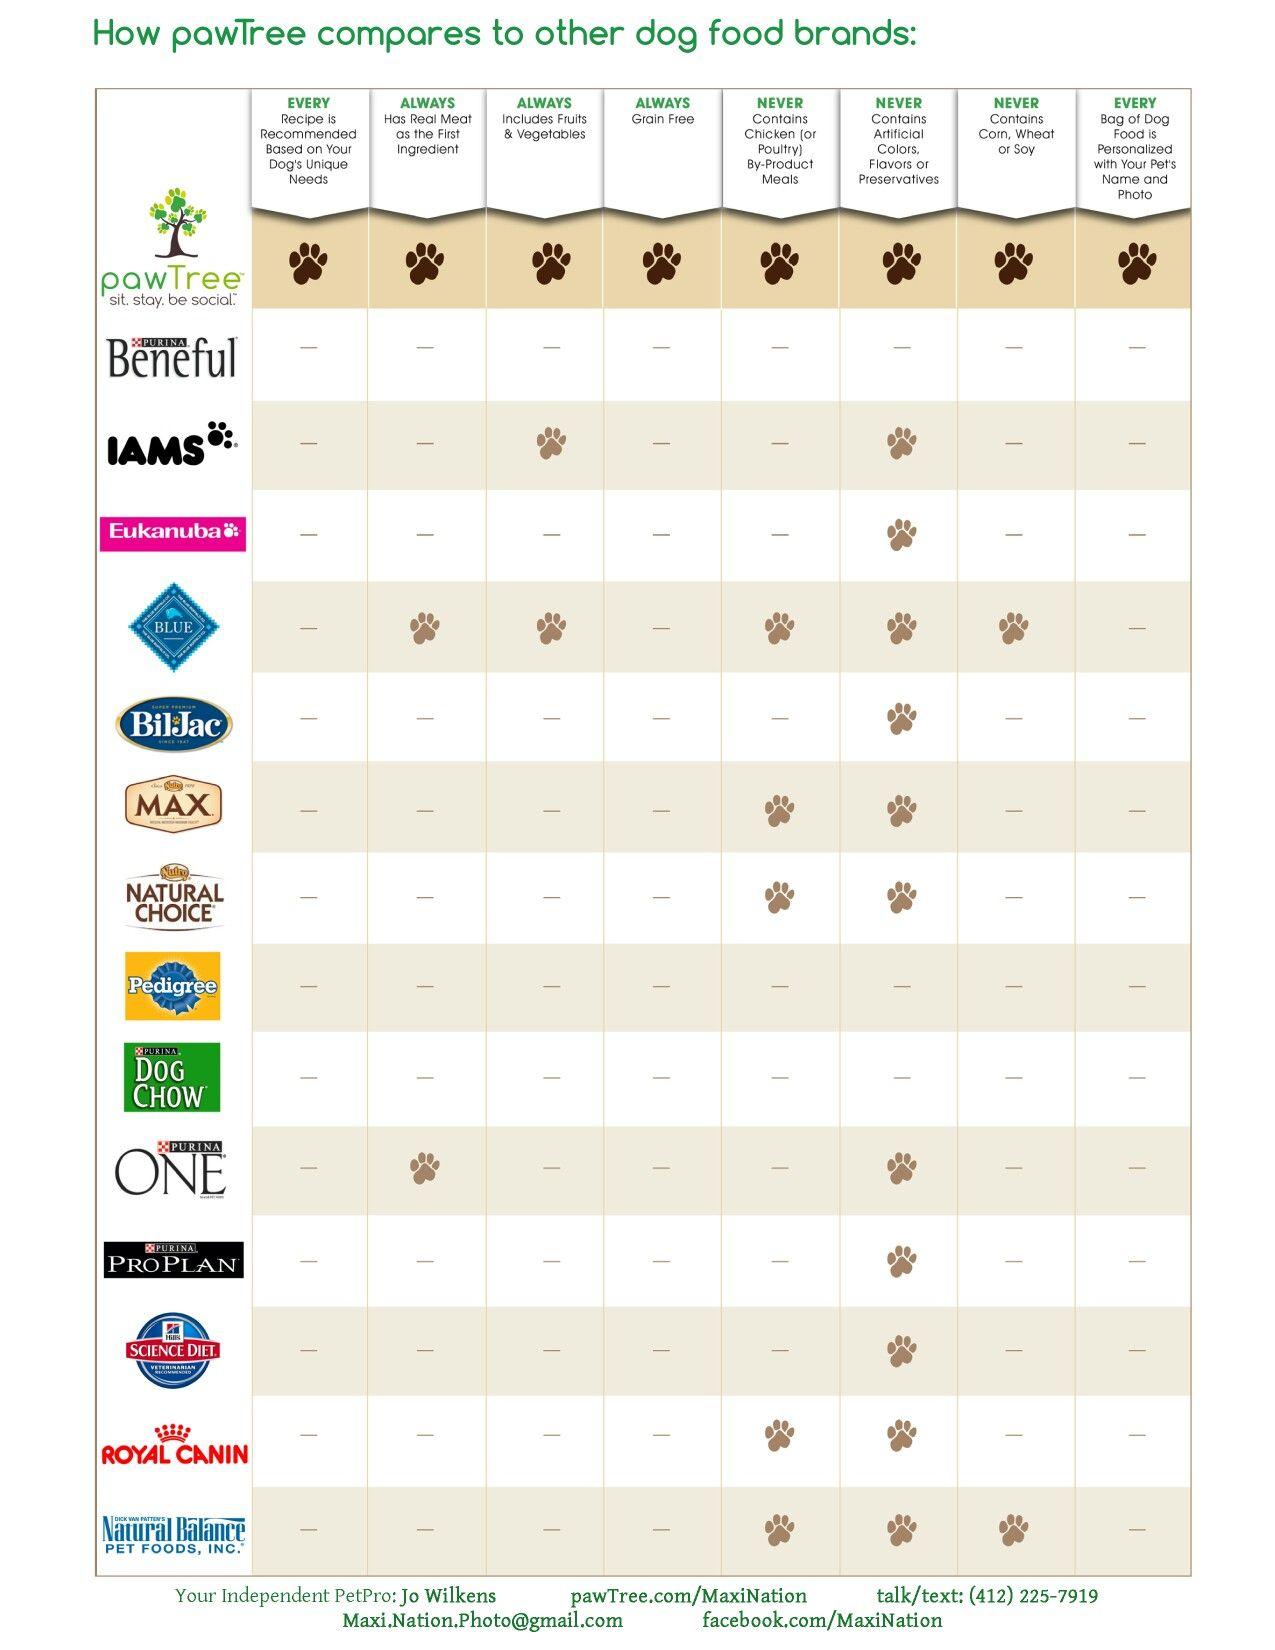 Dog food comparison chart. แฟนอาร์ท